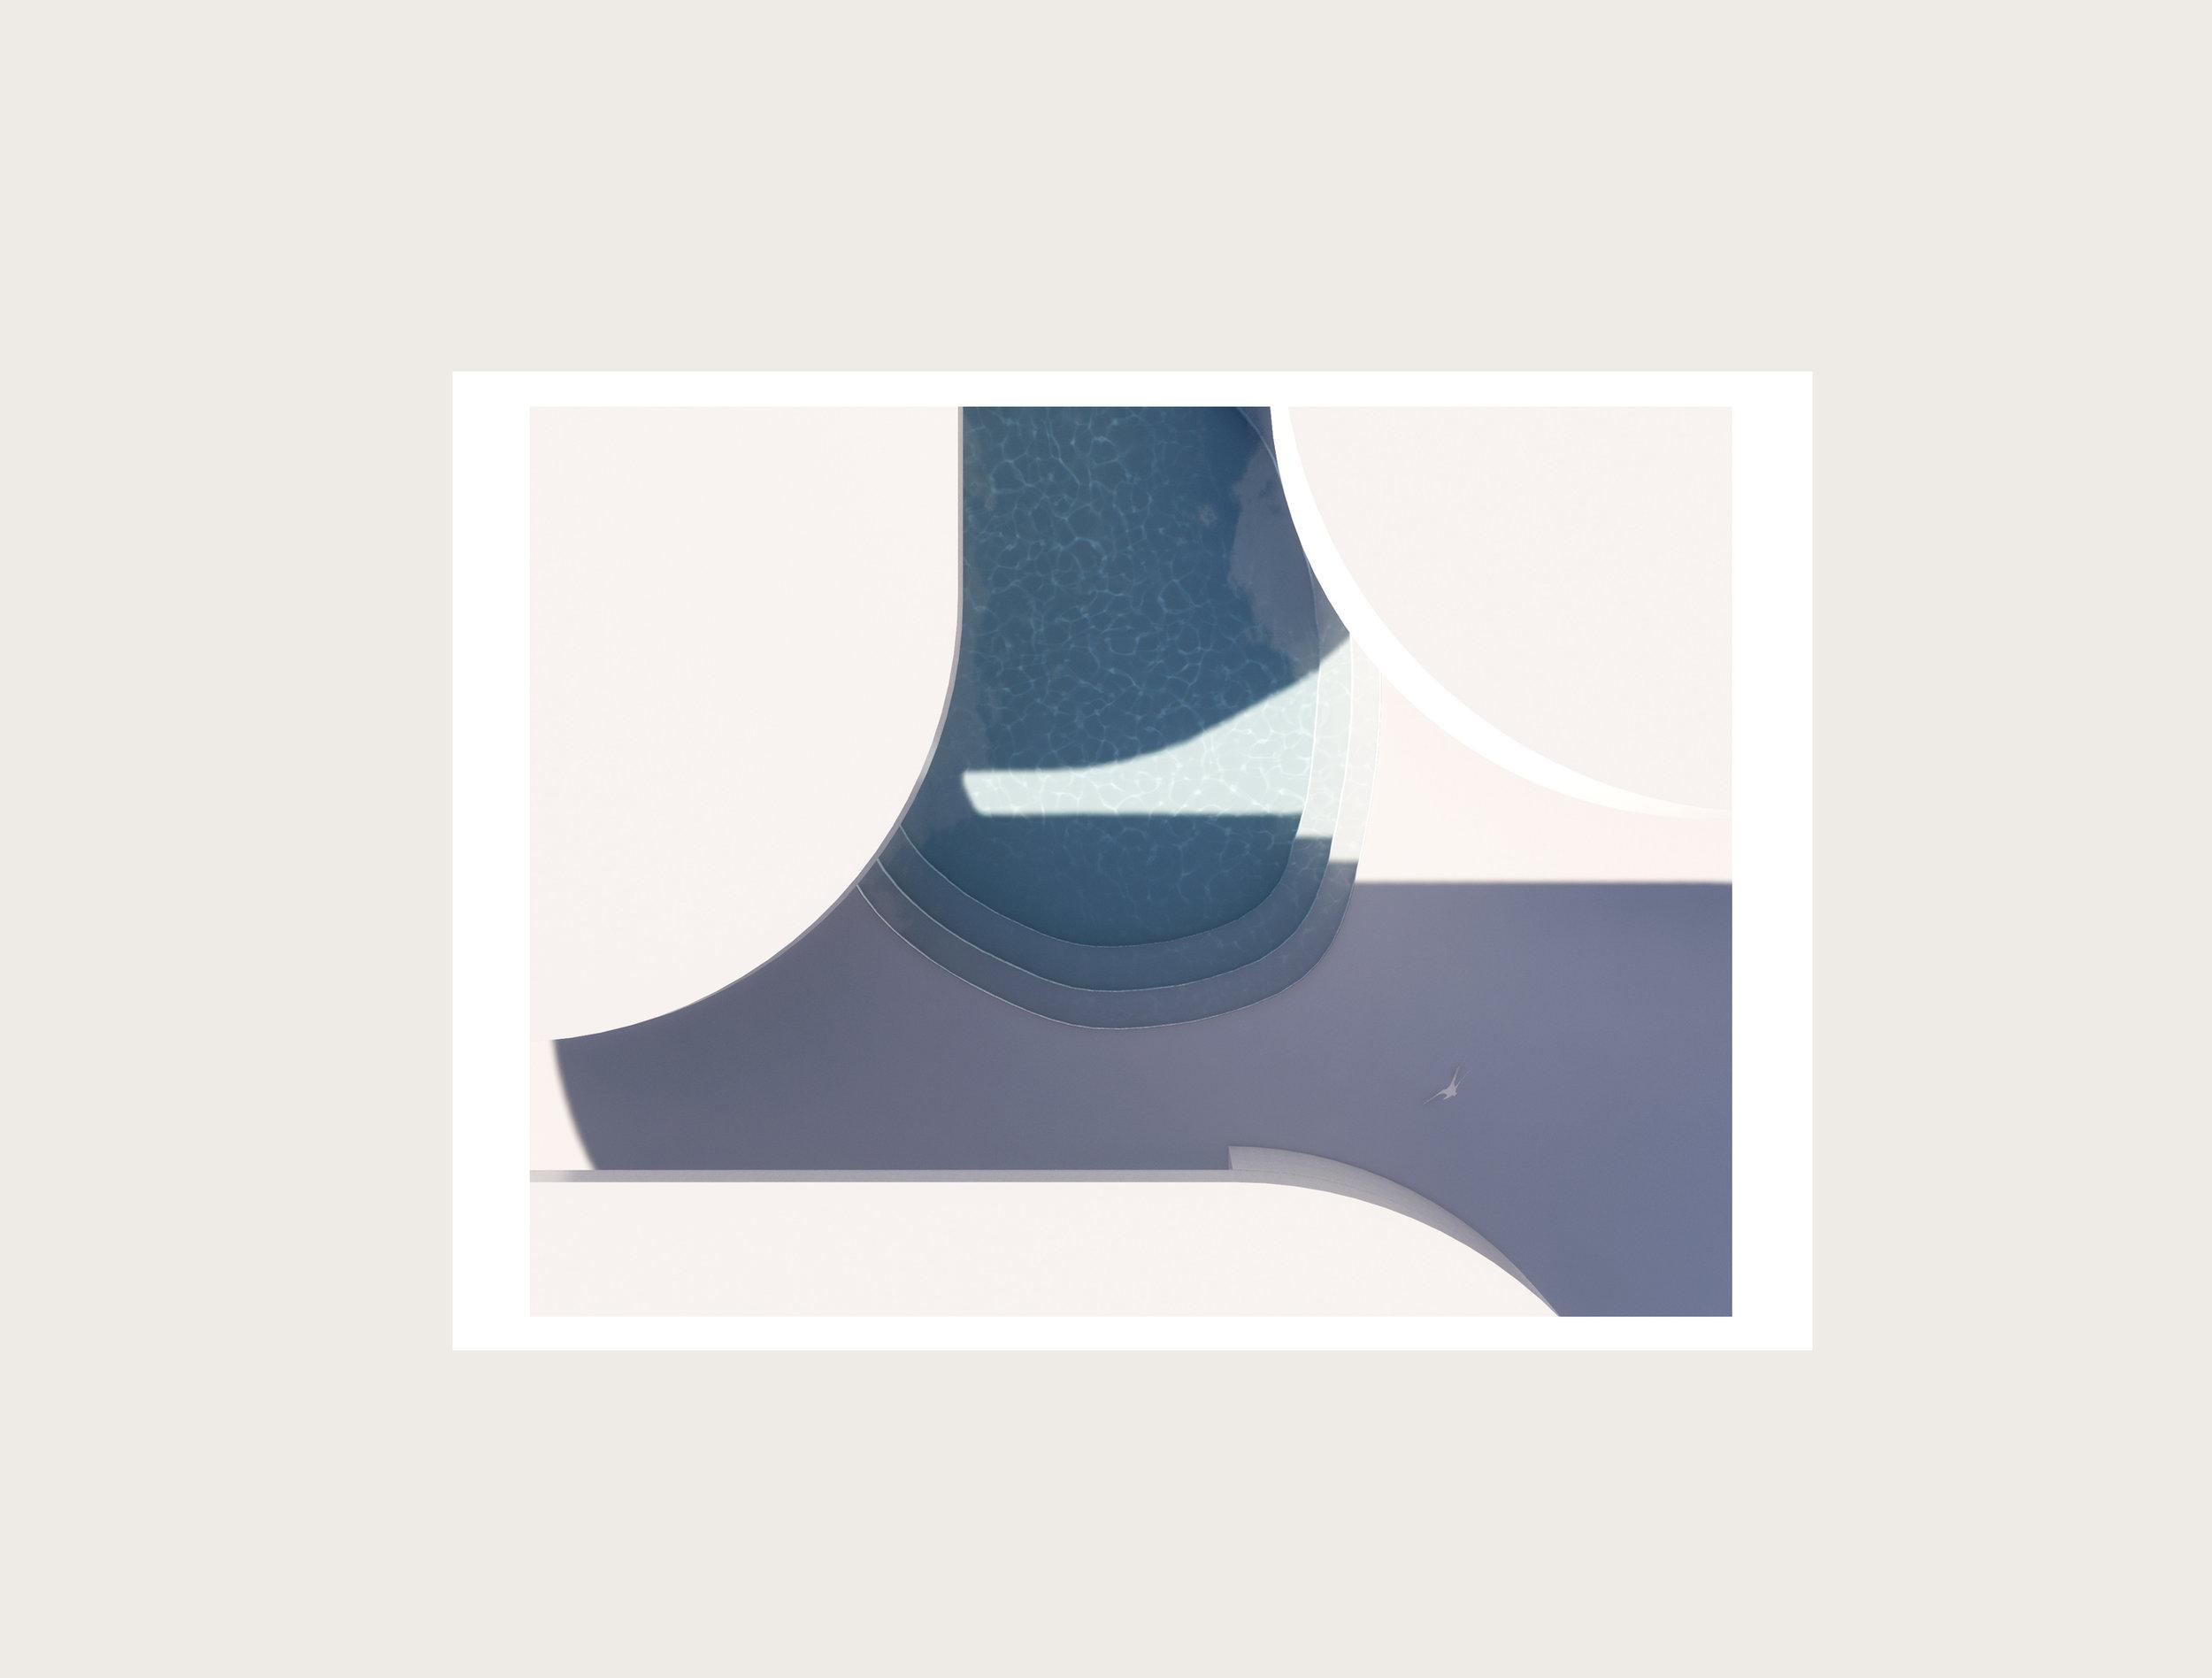 raams-architecture-design-studio-mango-house-sanya-china-villa-03.jpg